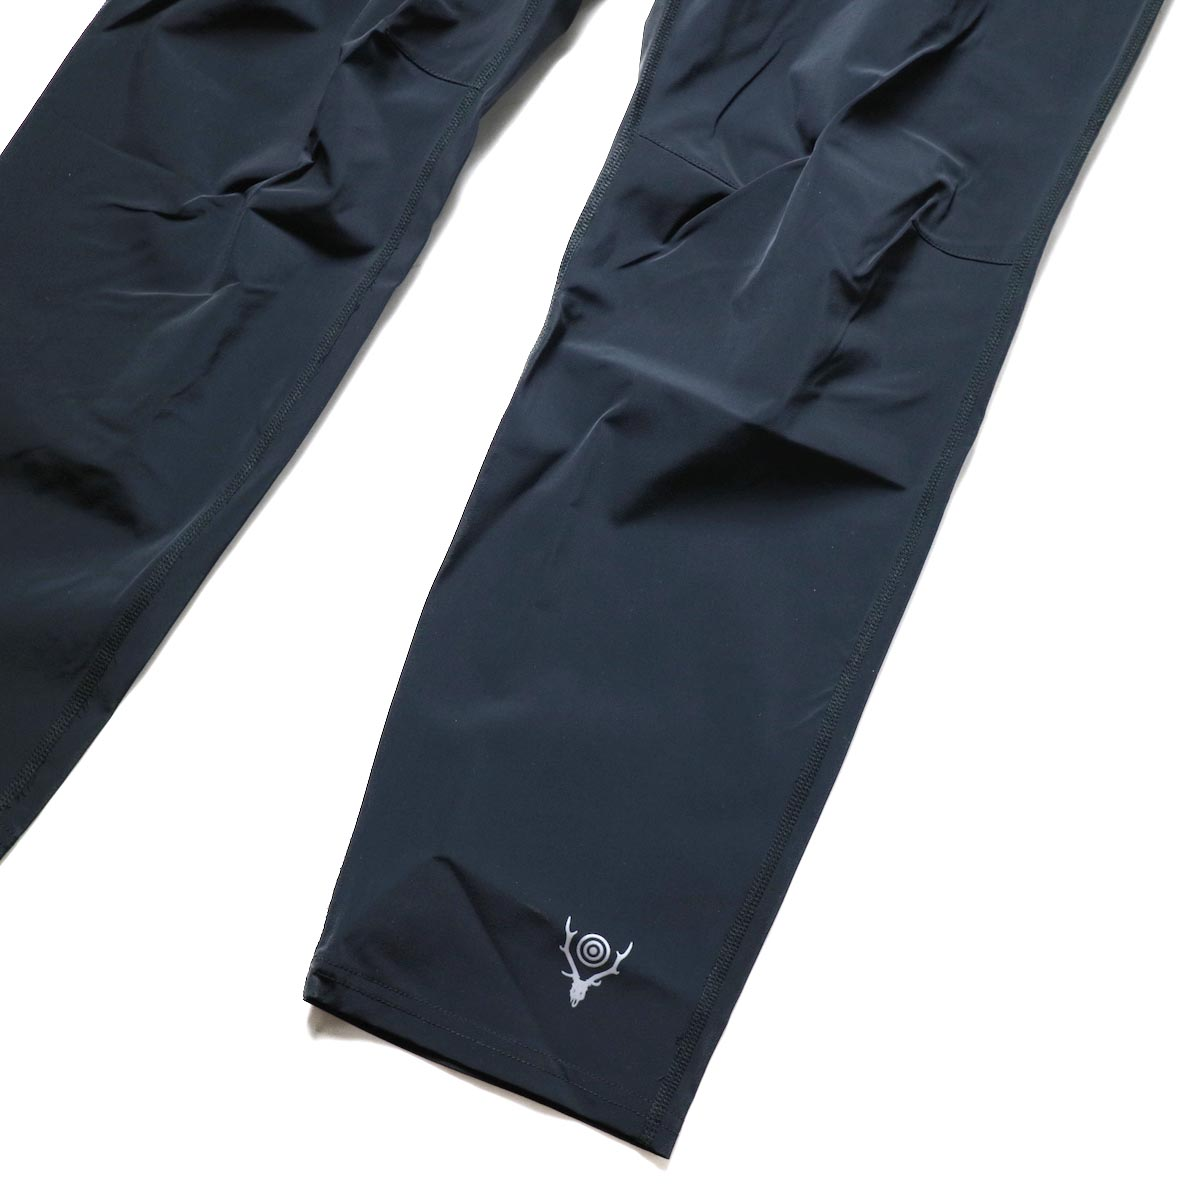 South2 West8 / 2P Cycle Pant -N/Pu Taffeta (Black)裾、ロゴ